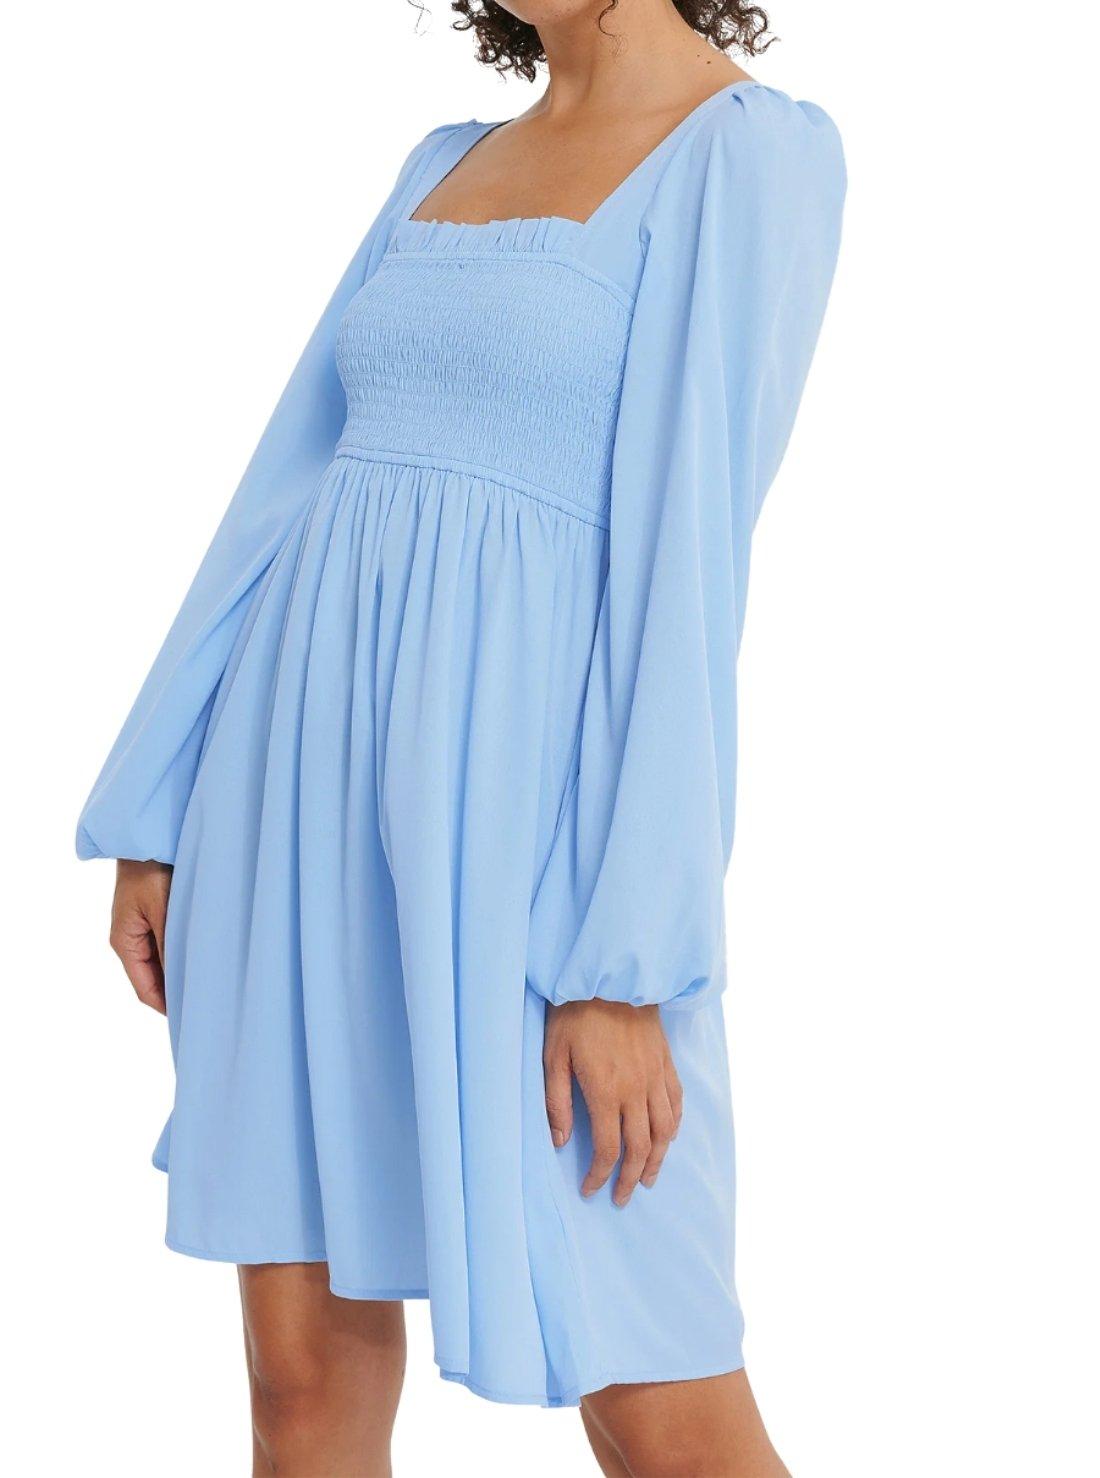 Wholesale Square Collar Chiffon Dress